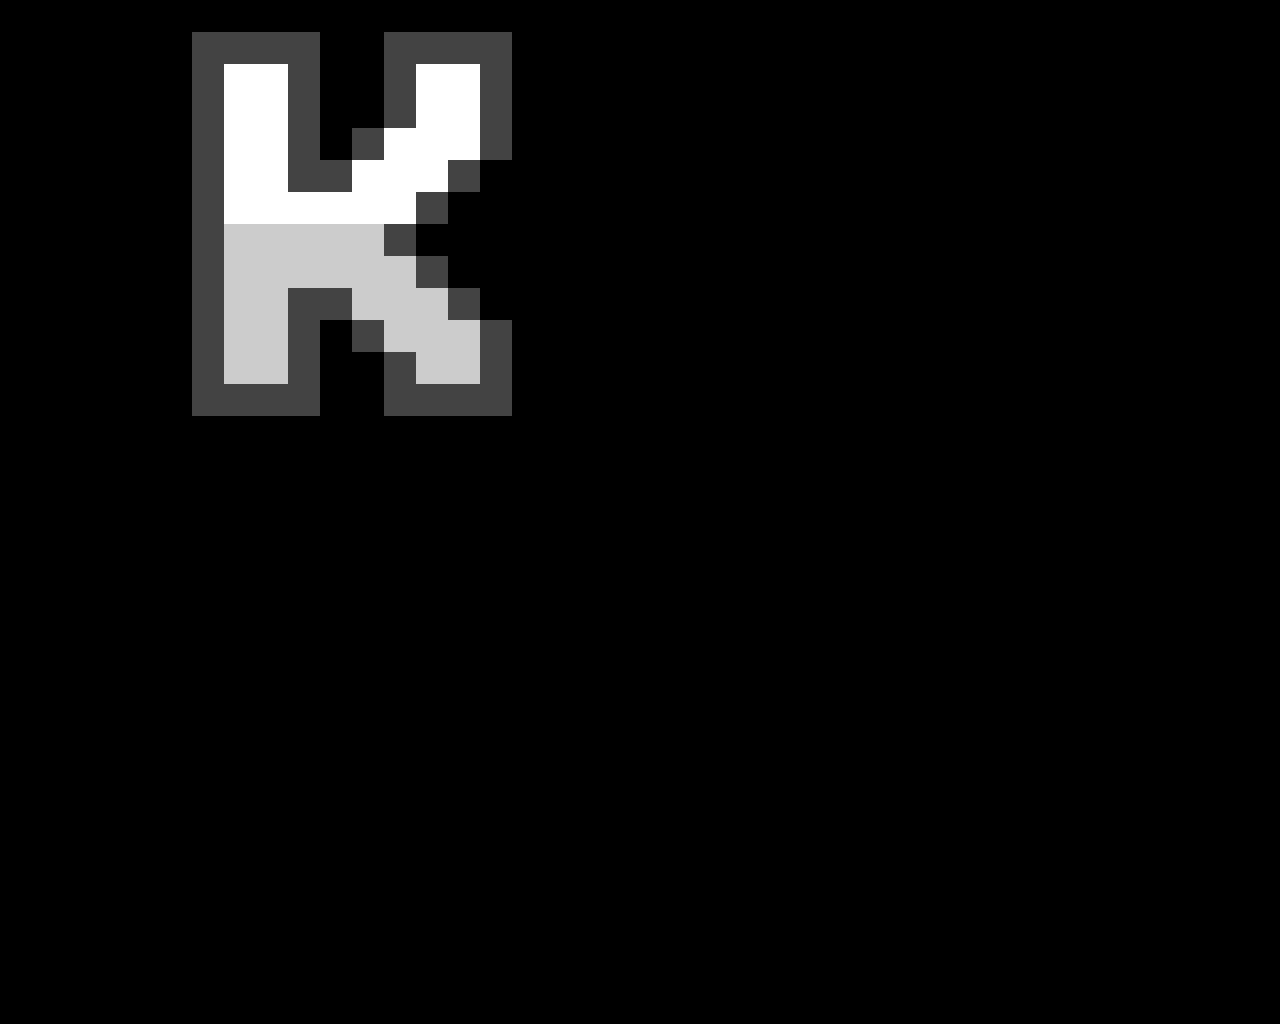 pixel letter K